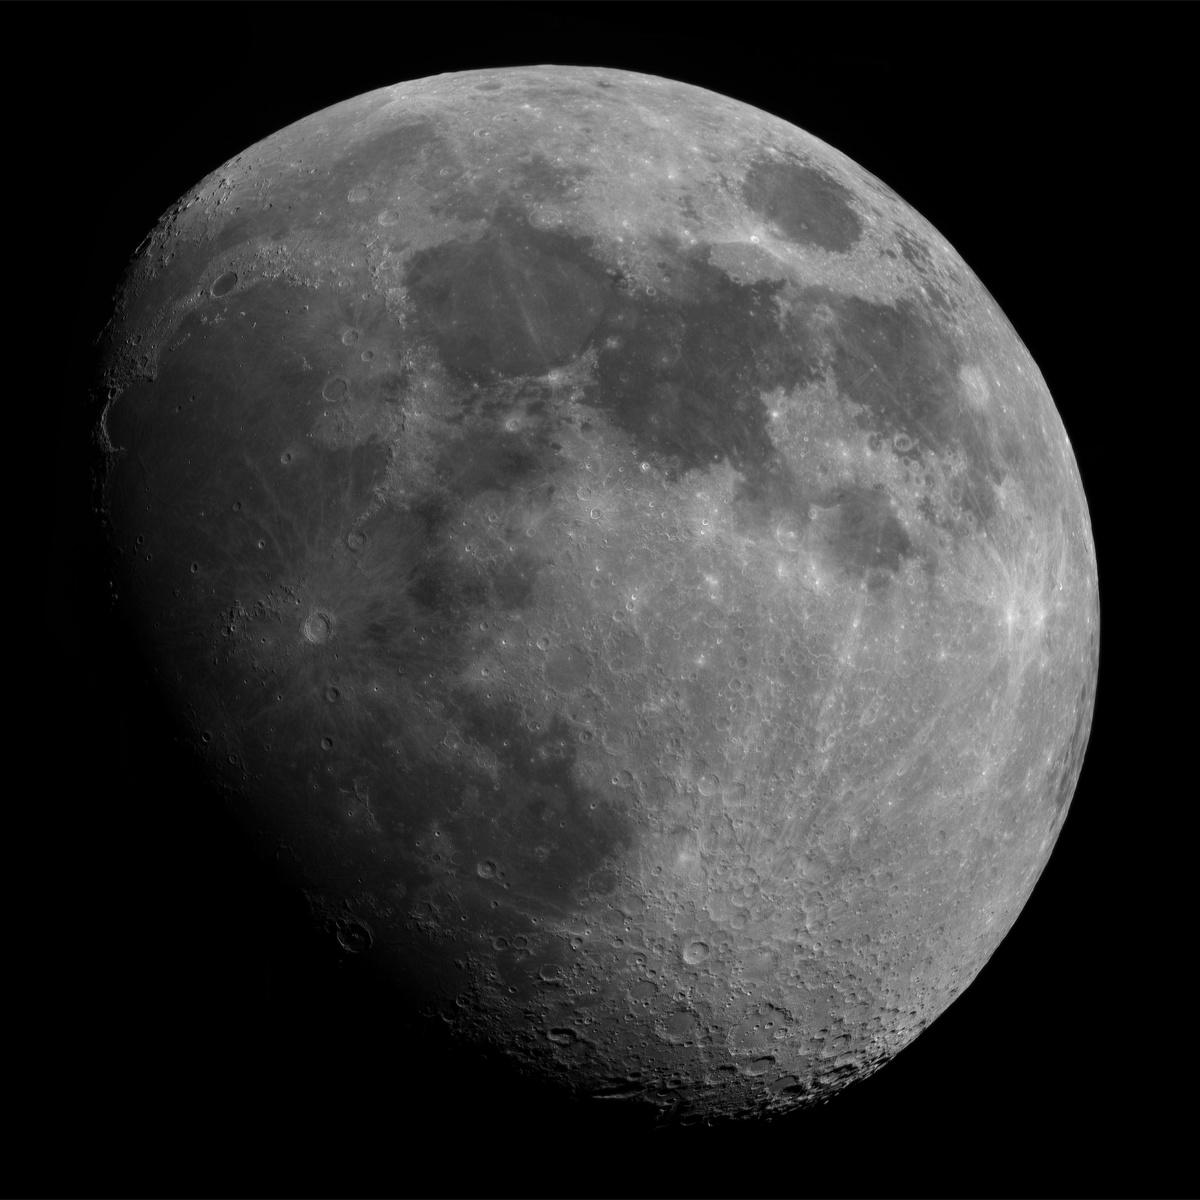 moon100k.thumb.jpg.35ed35d084243c98fe720807578efdeb.jpg